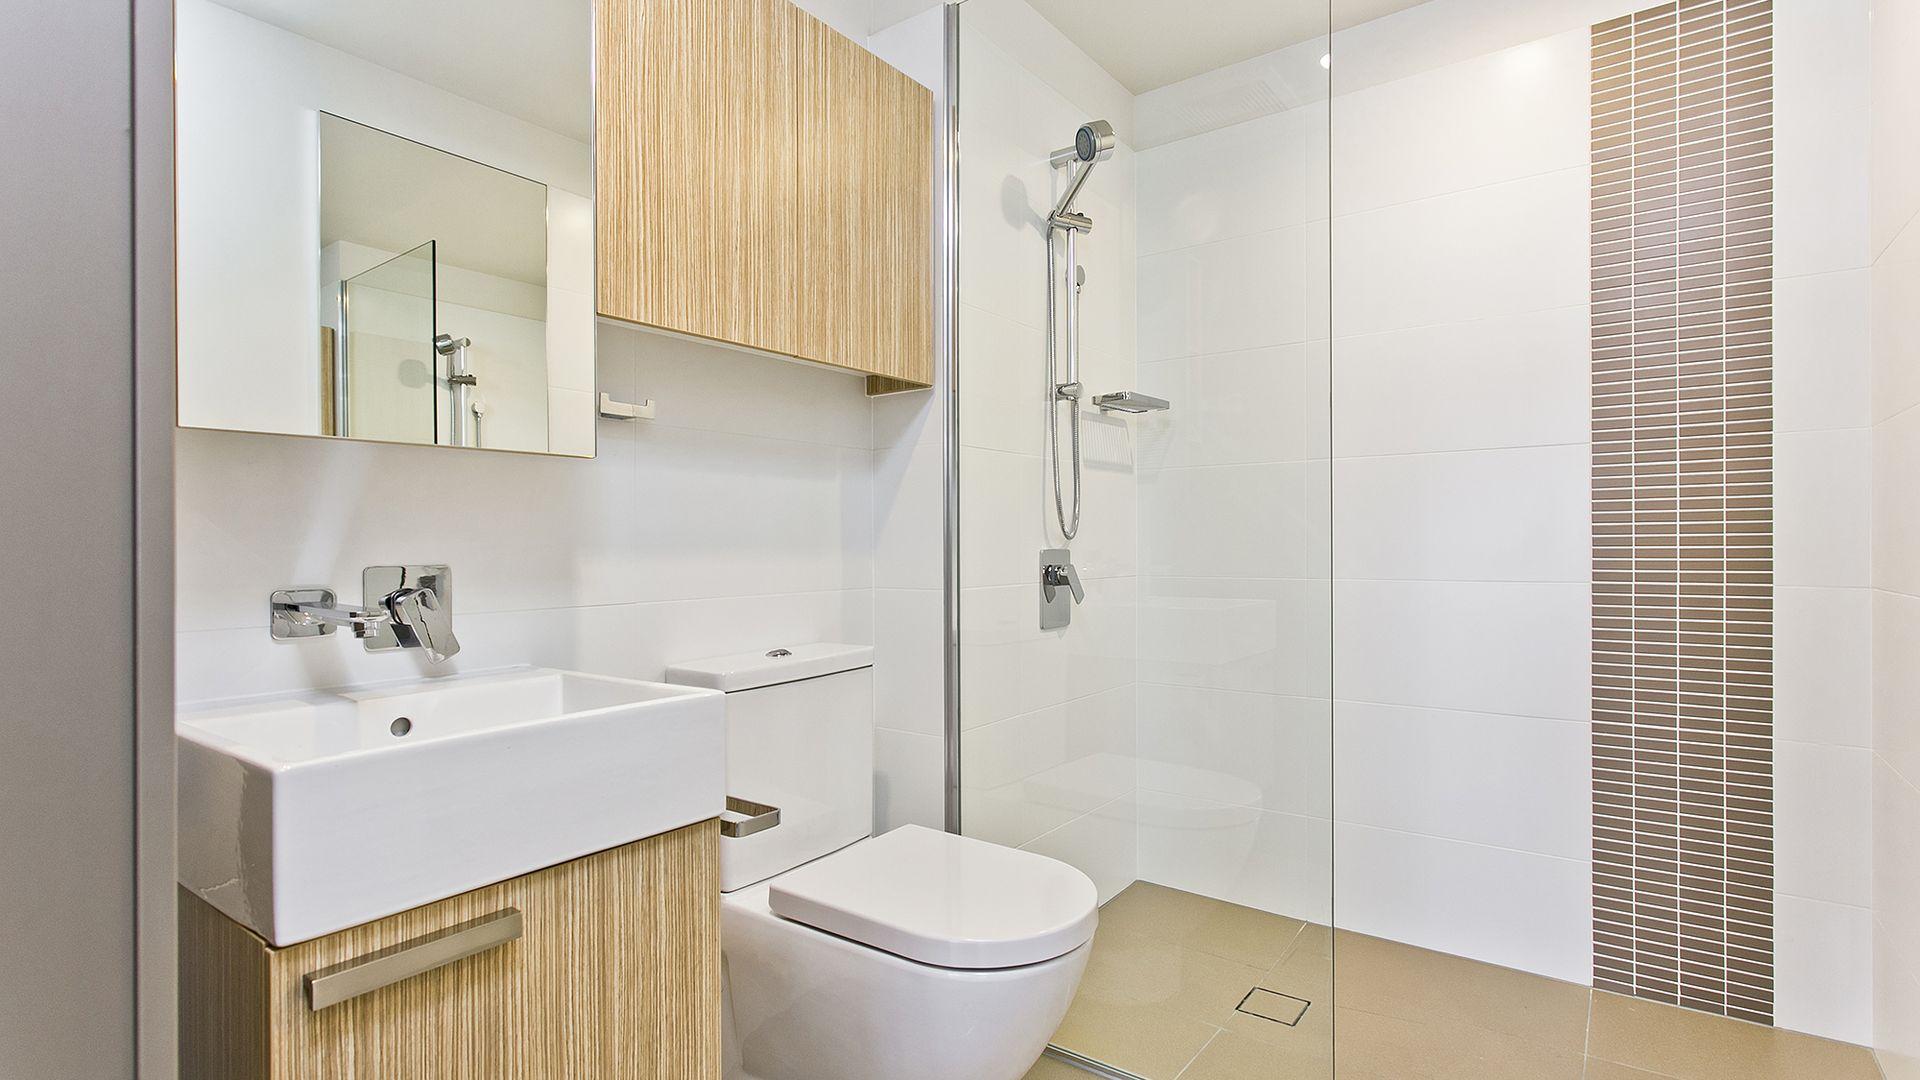 512/16 Aspinall Street, Nundah QLD 4012, Image 2